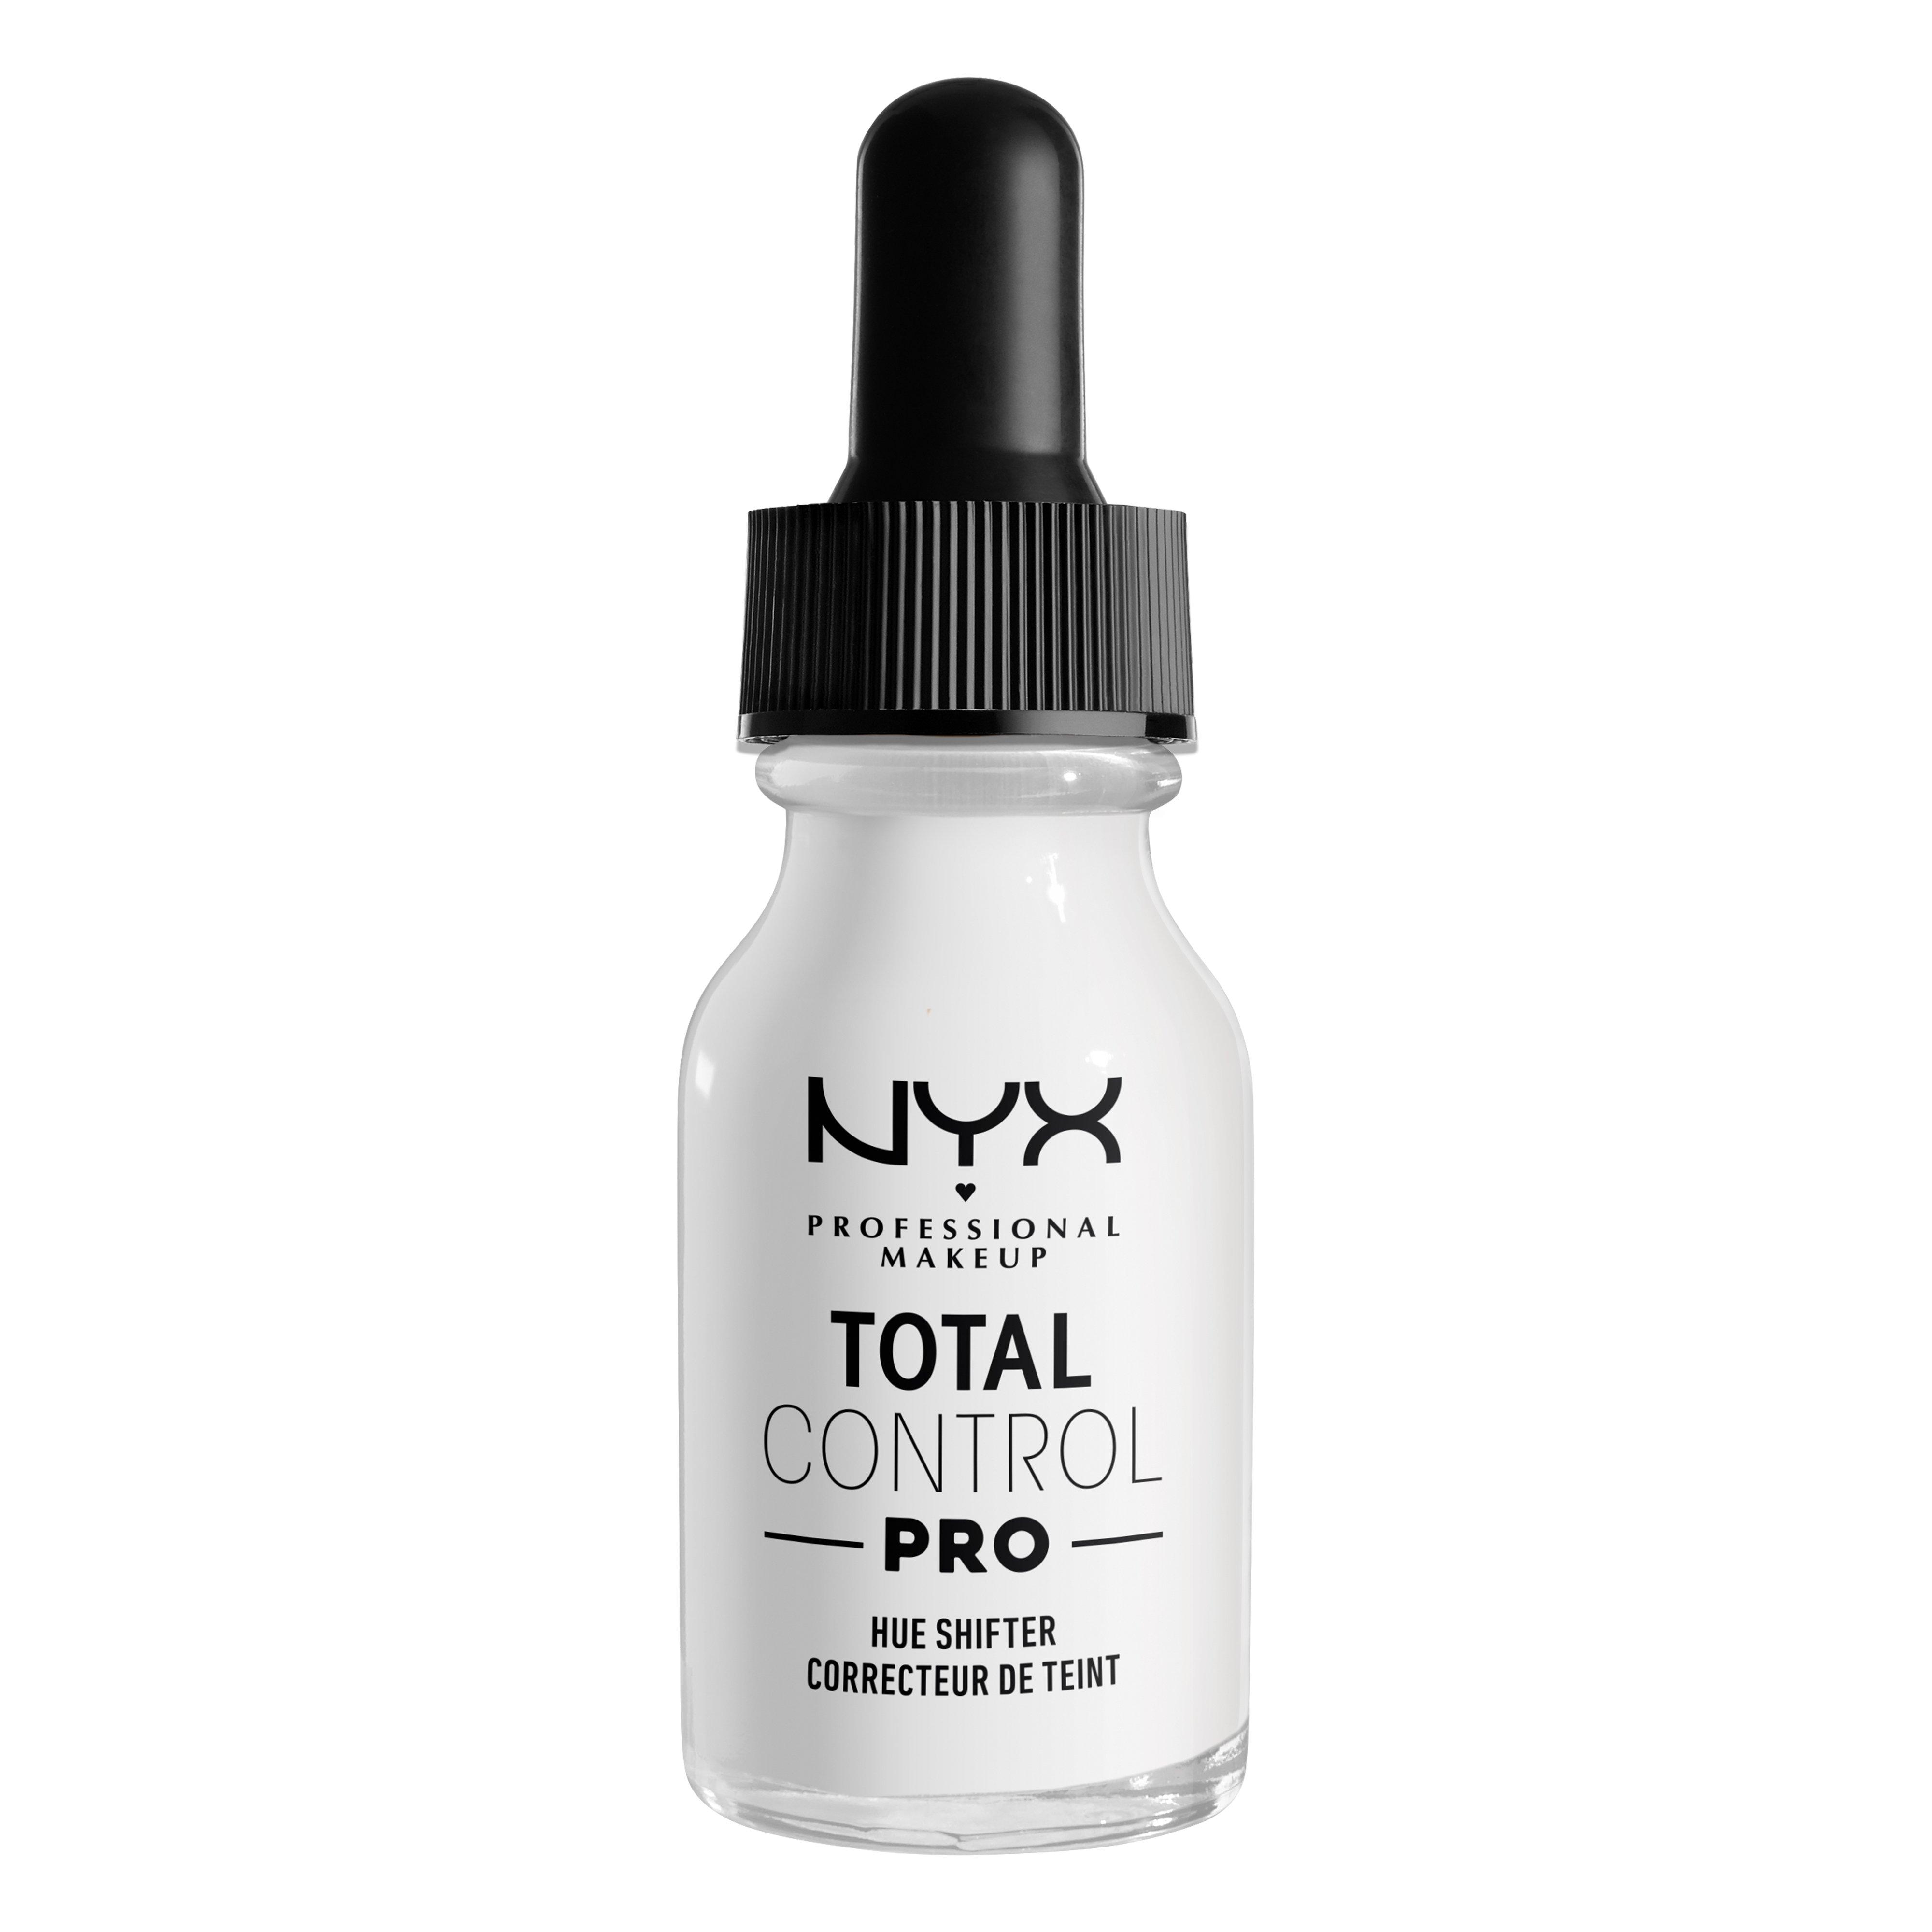 NYX Professional Makeup - Total Control Pro Hue Shifter - Light